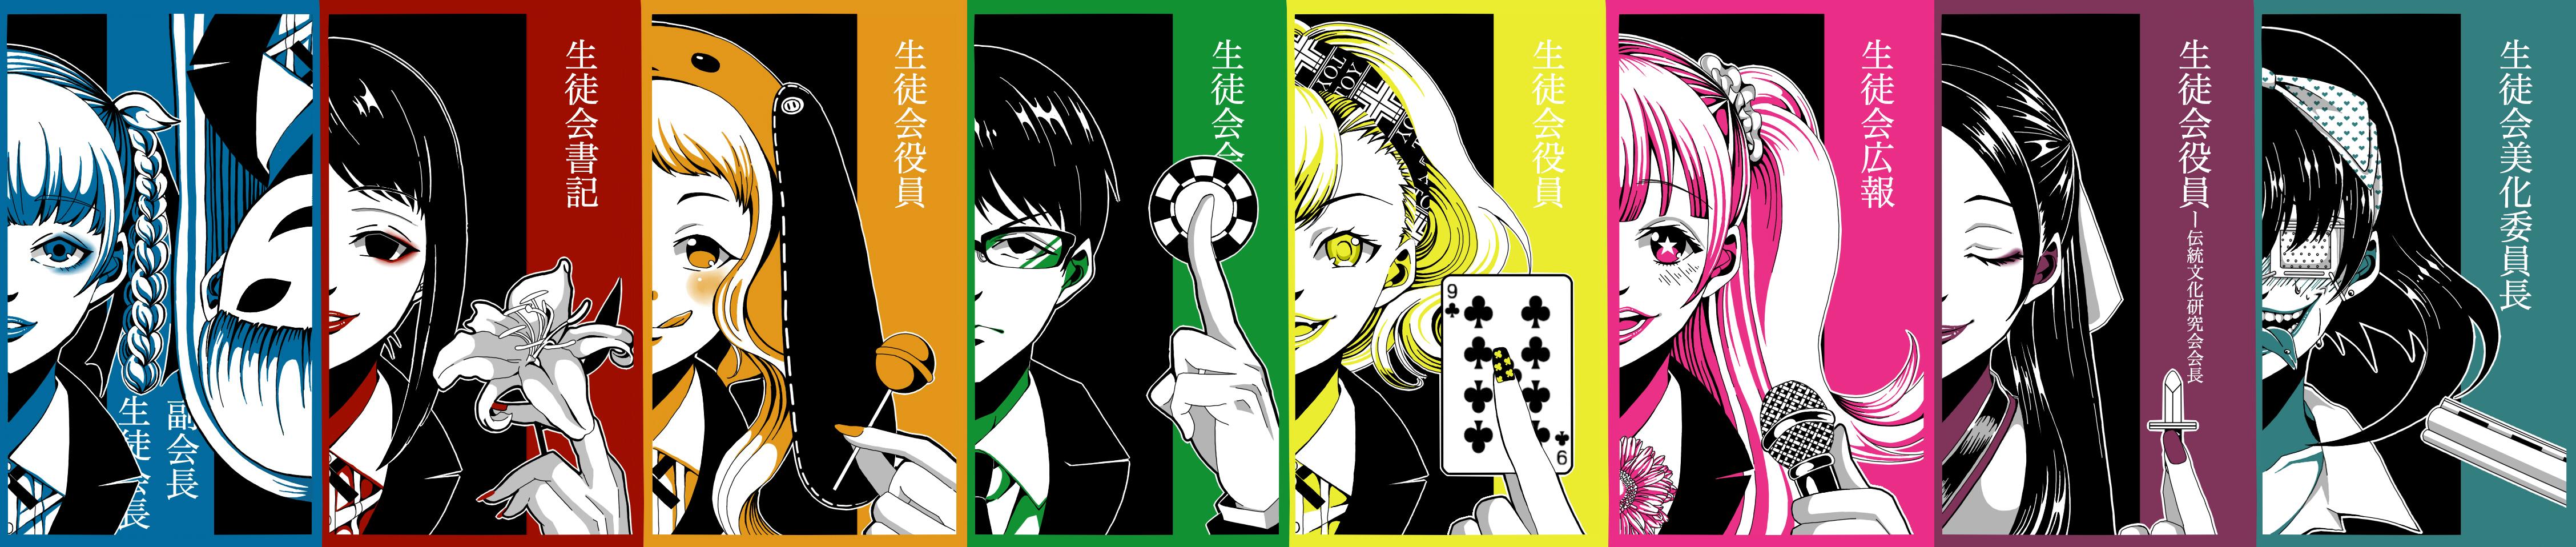 4 Runa Yomozuki Hd Wallpapers Background Images